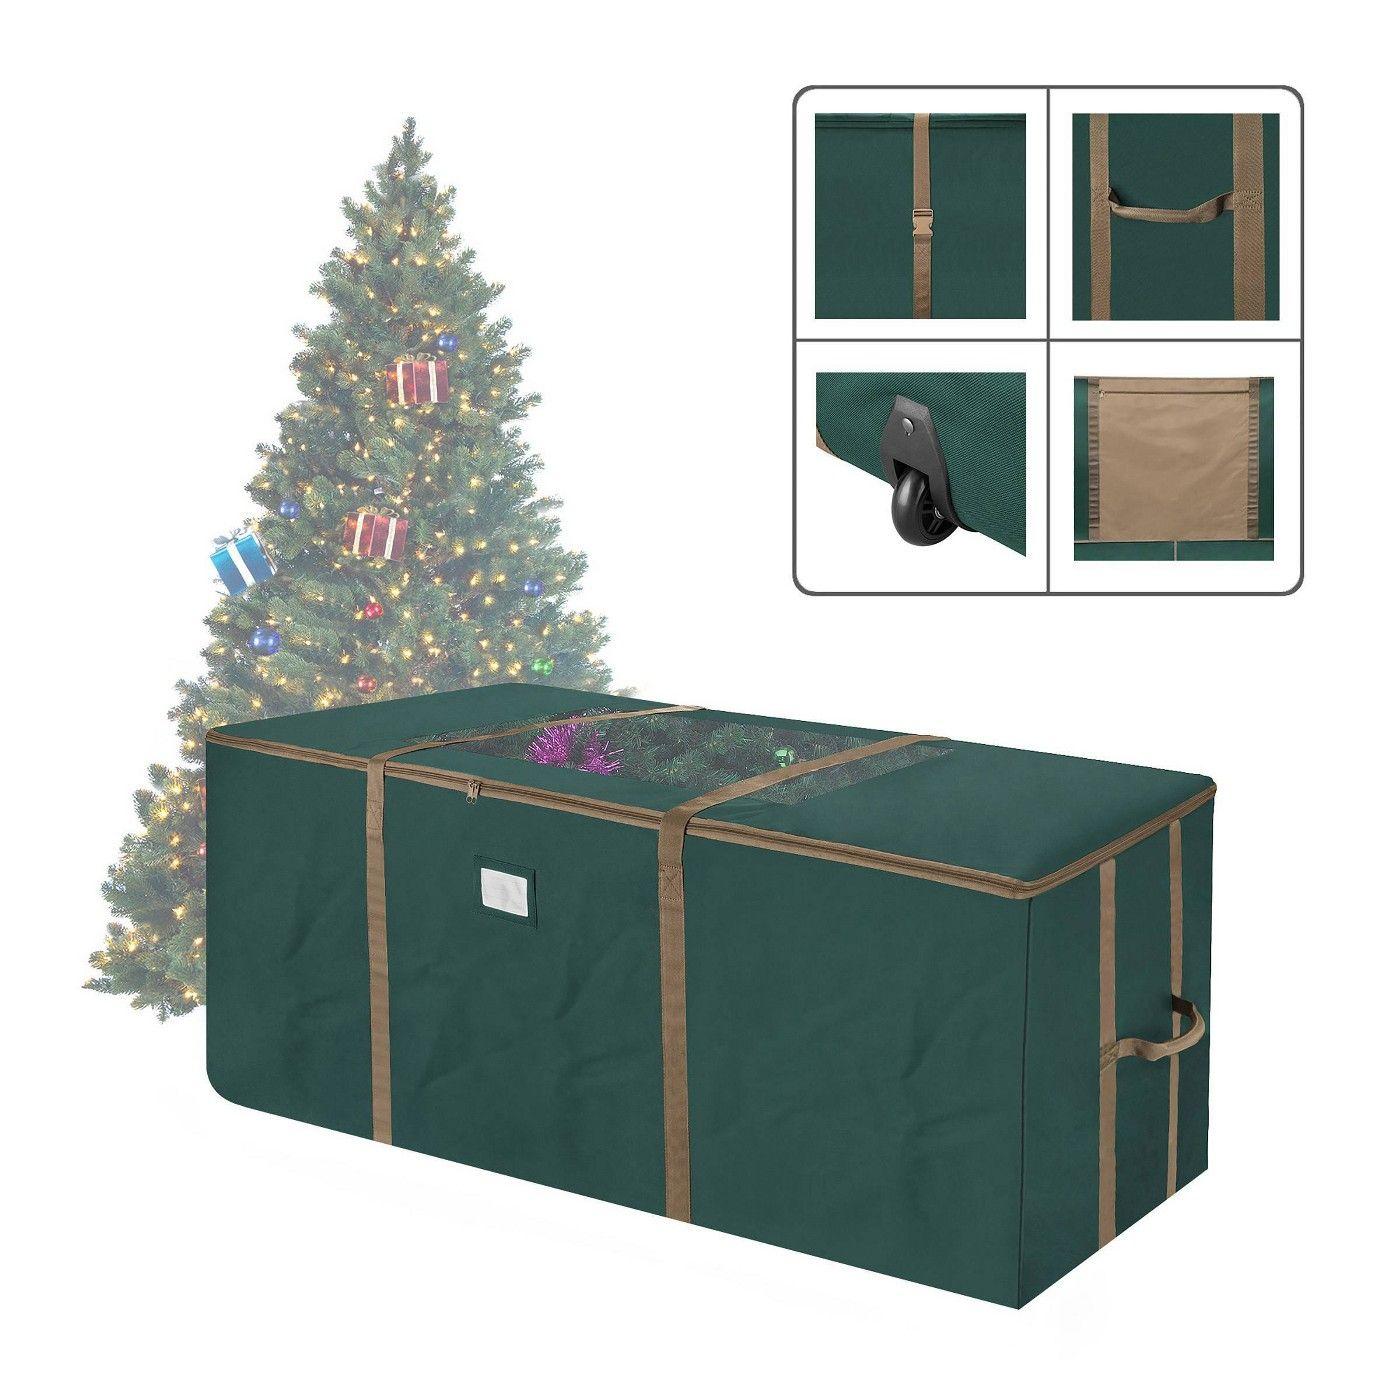 Elf Stor 9 Rolling Christmas Tree Storage Duffel Bag Green Christmas Tree Storage Bag Tree Storage Bag Christmas Tree Storage Rolling christmas tree storage bag